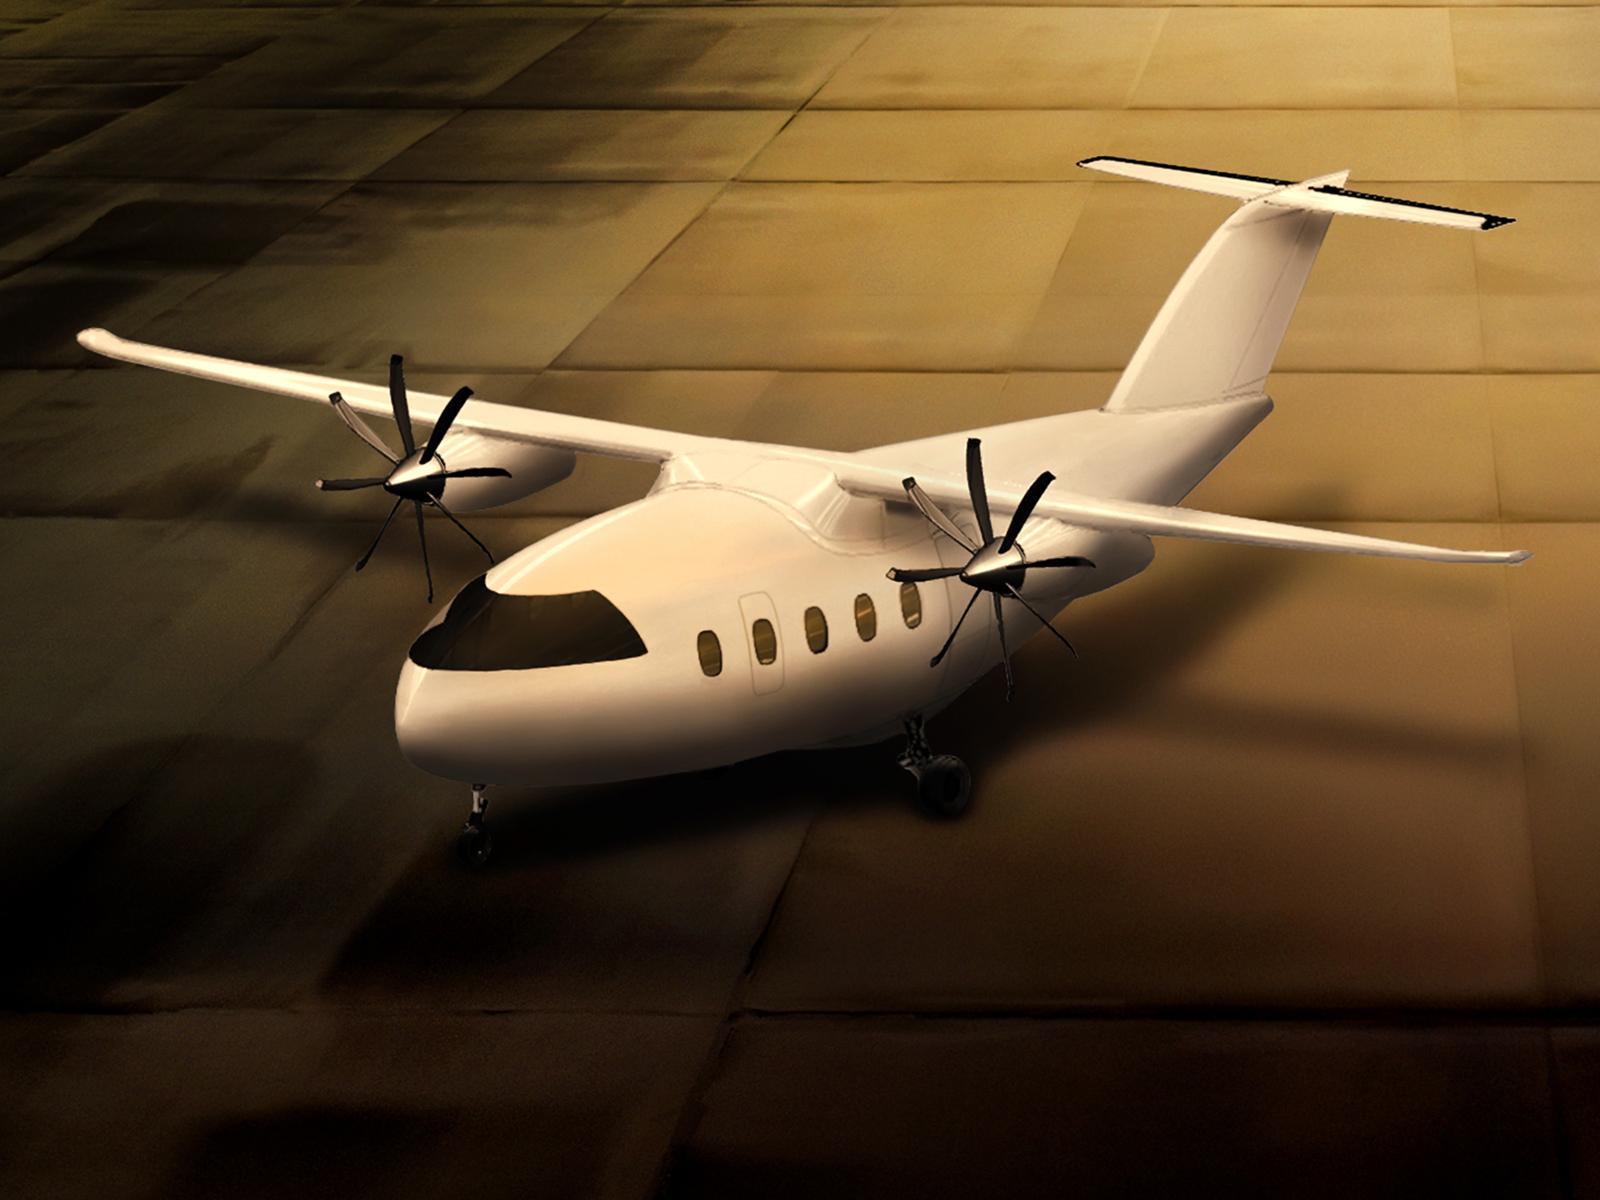 small plane_1557977785687.jpg.jpg